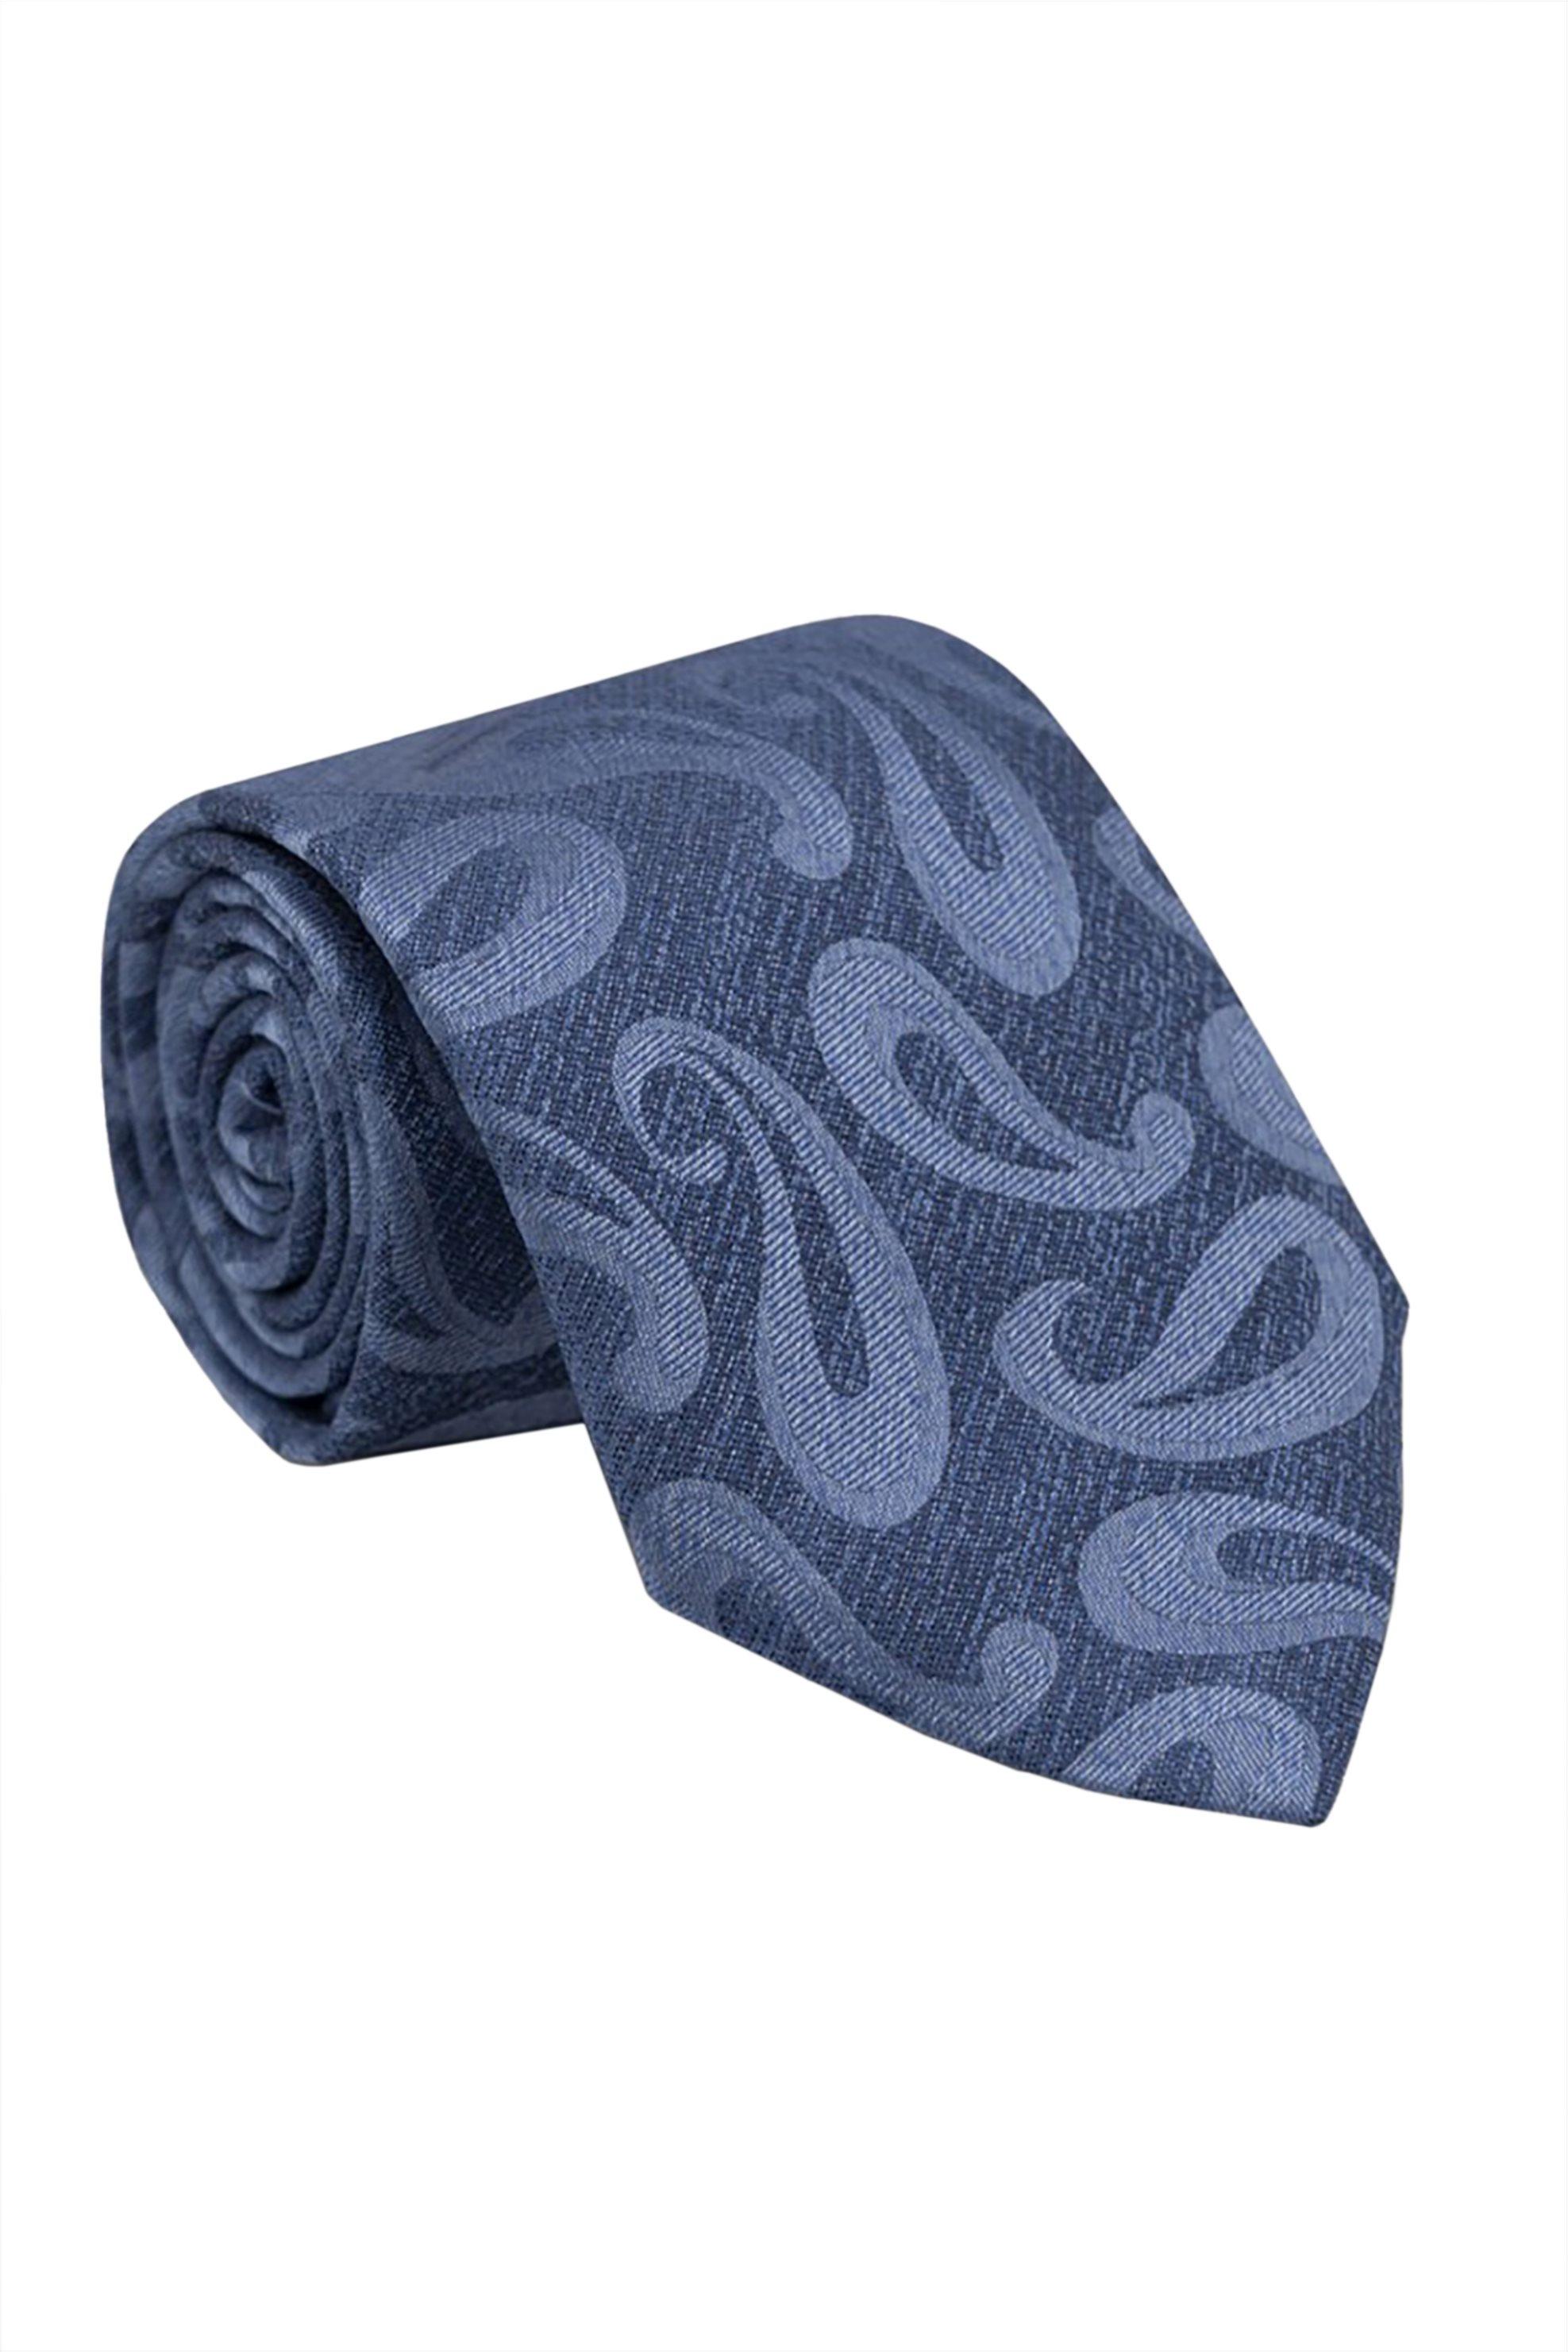 Oxford Company ανδρική μεταξωτή γραβάτα με all-over print - TIE51-414.01 - Μπλε